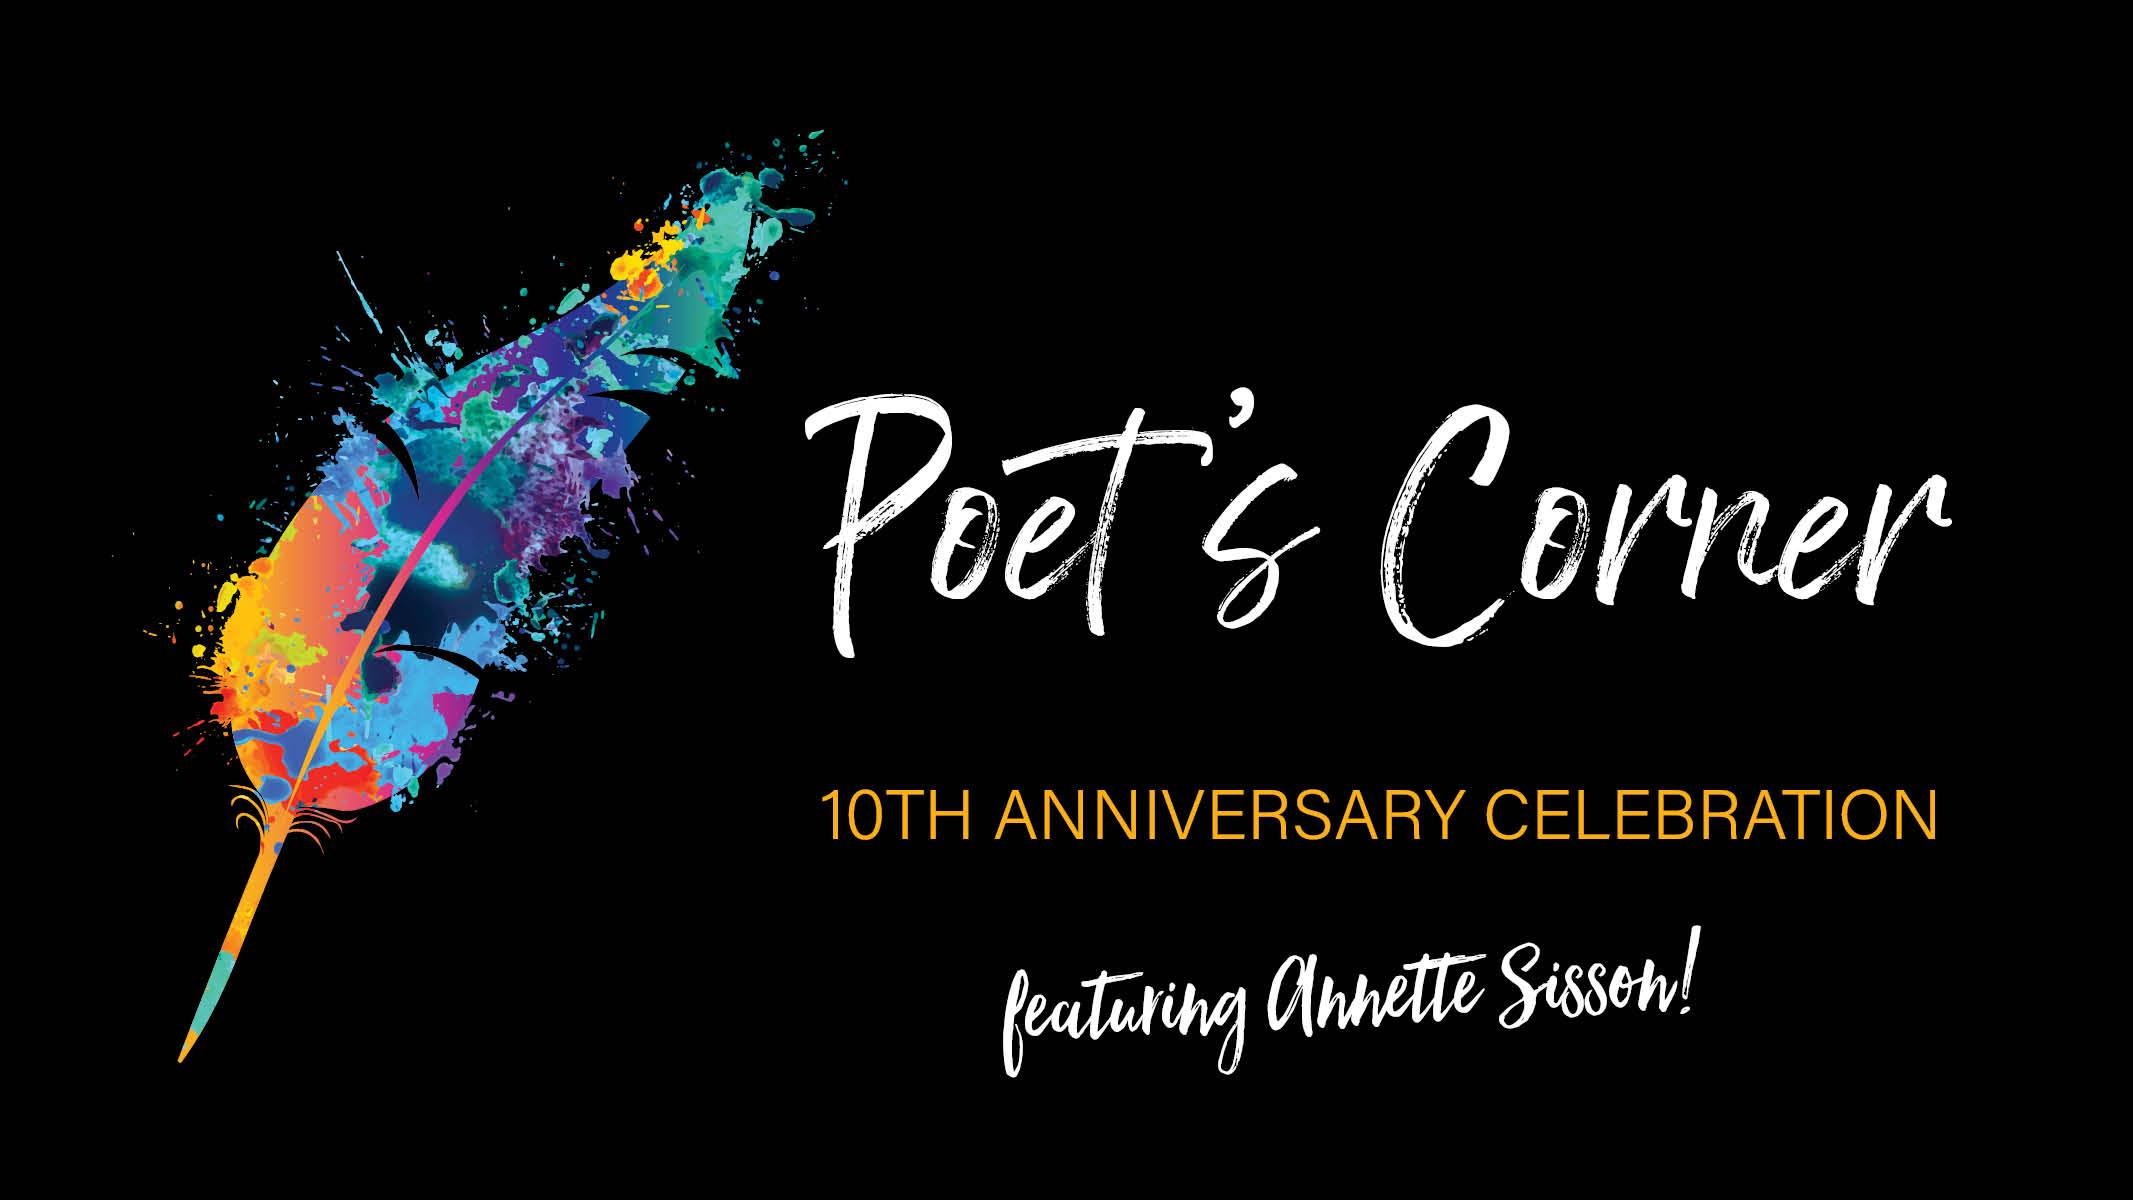 Poet's Corner 10th Anniversary Celebration featuring Annette Sisson